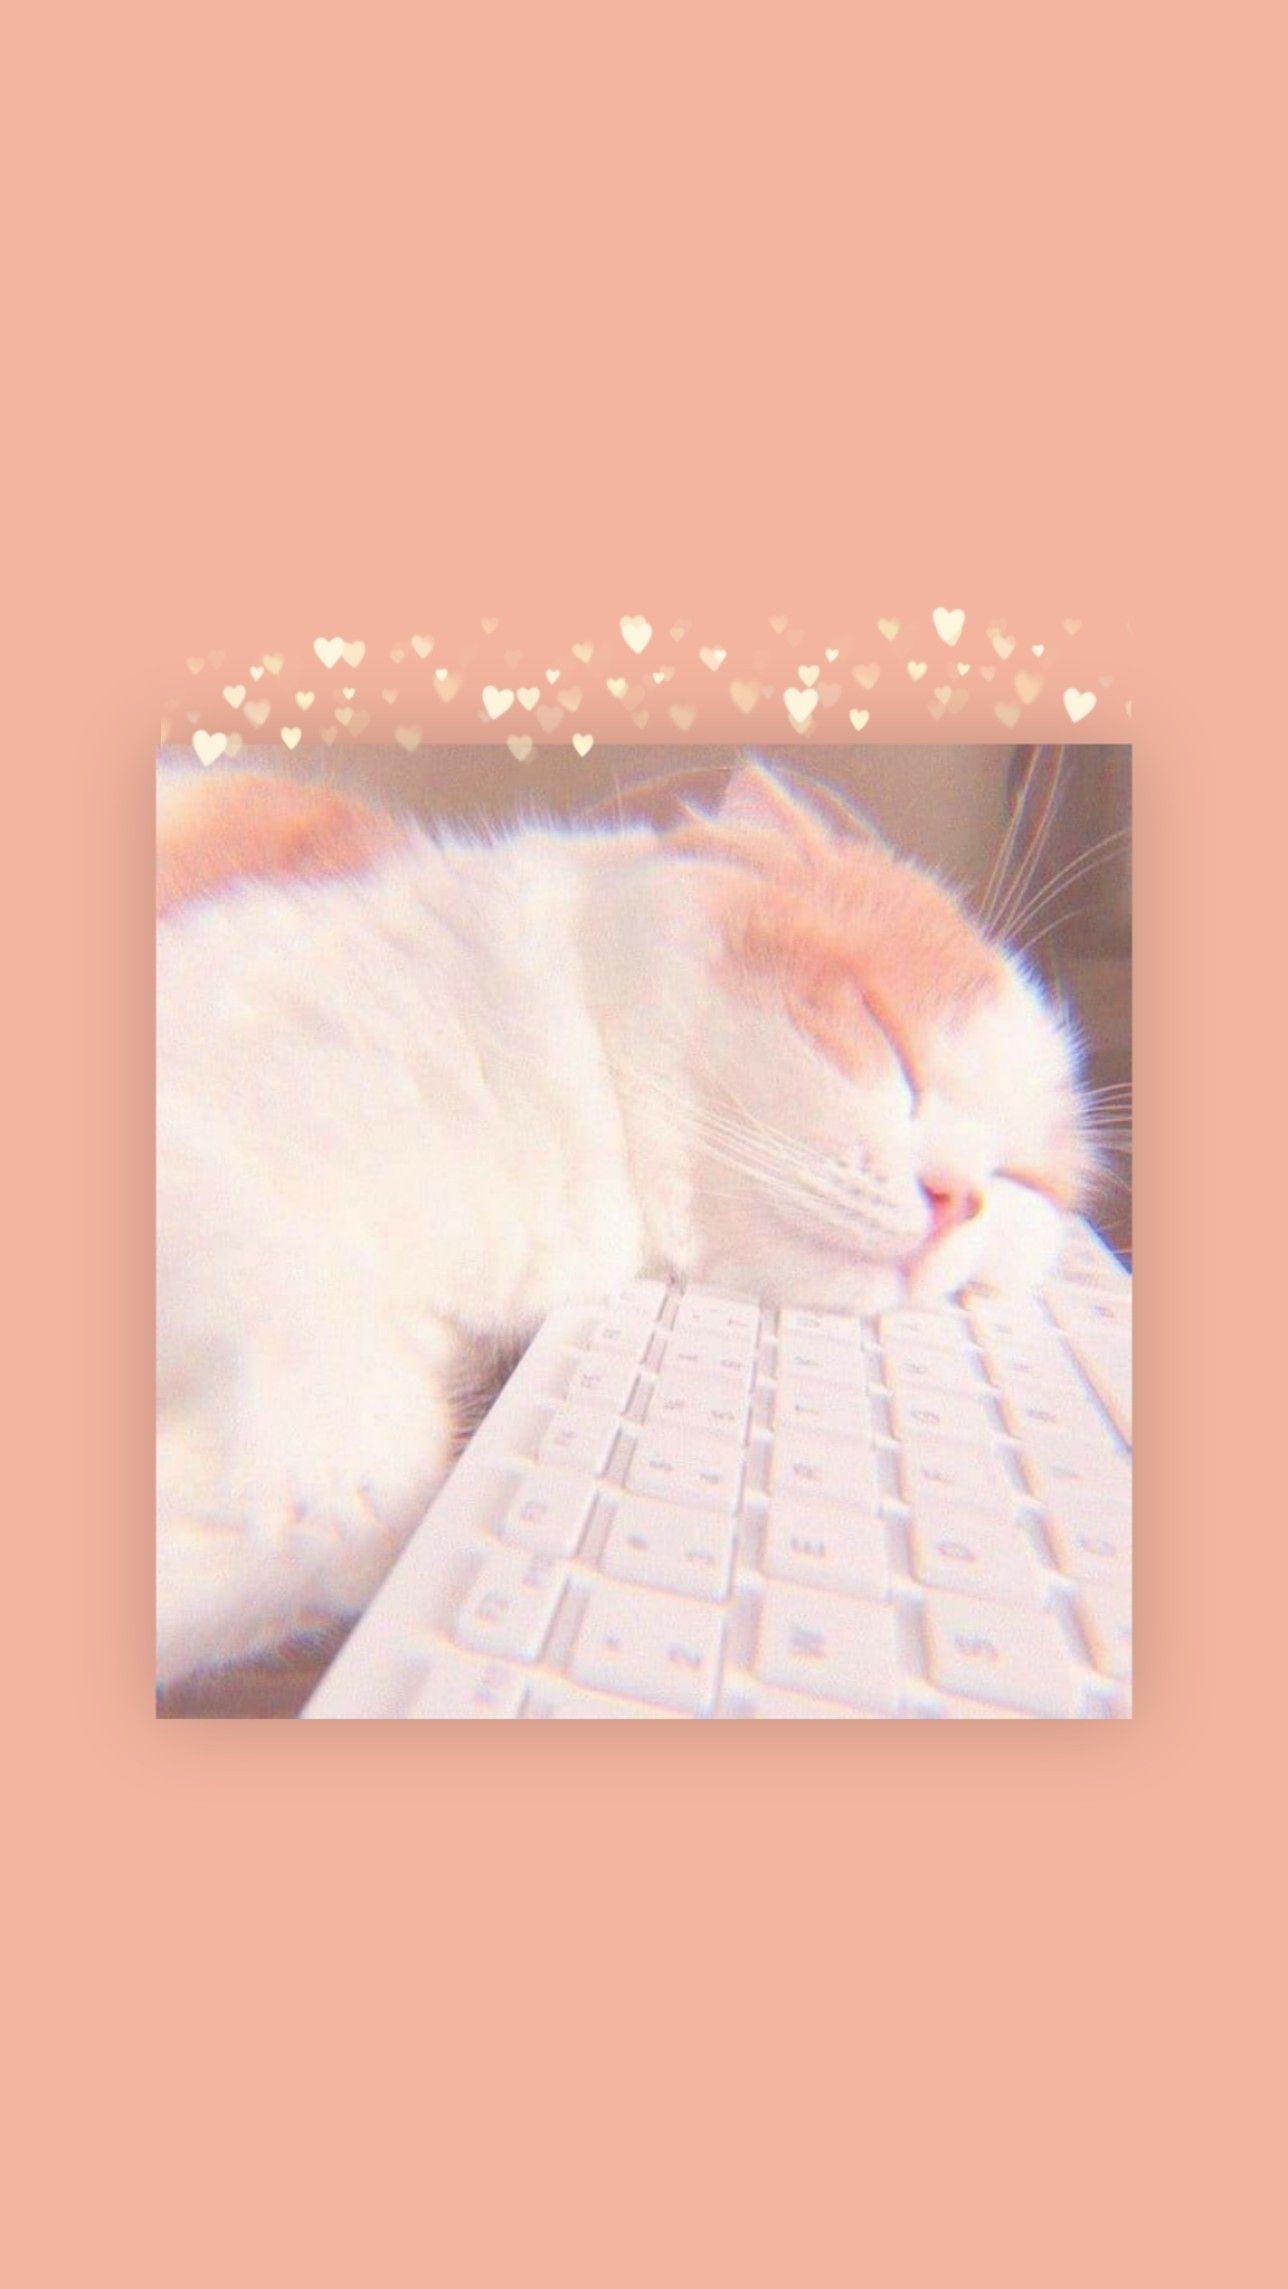 Cute Cat Aesthetic Wallpaper Wallpaper Estetika Kertas Dinding Wallpaper Iphone Lucu